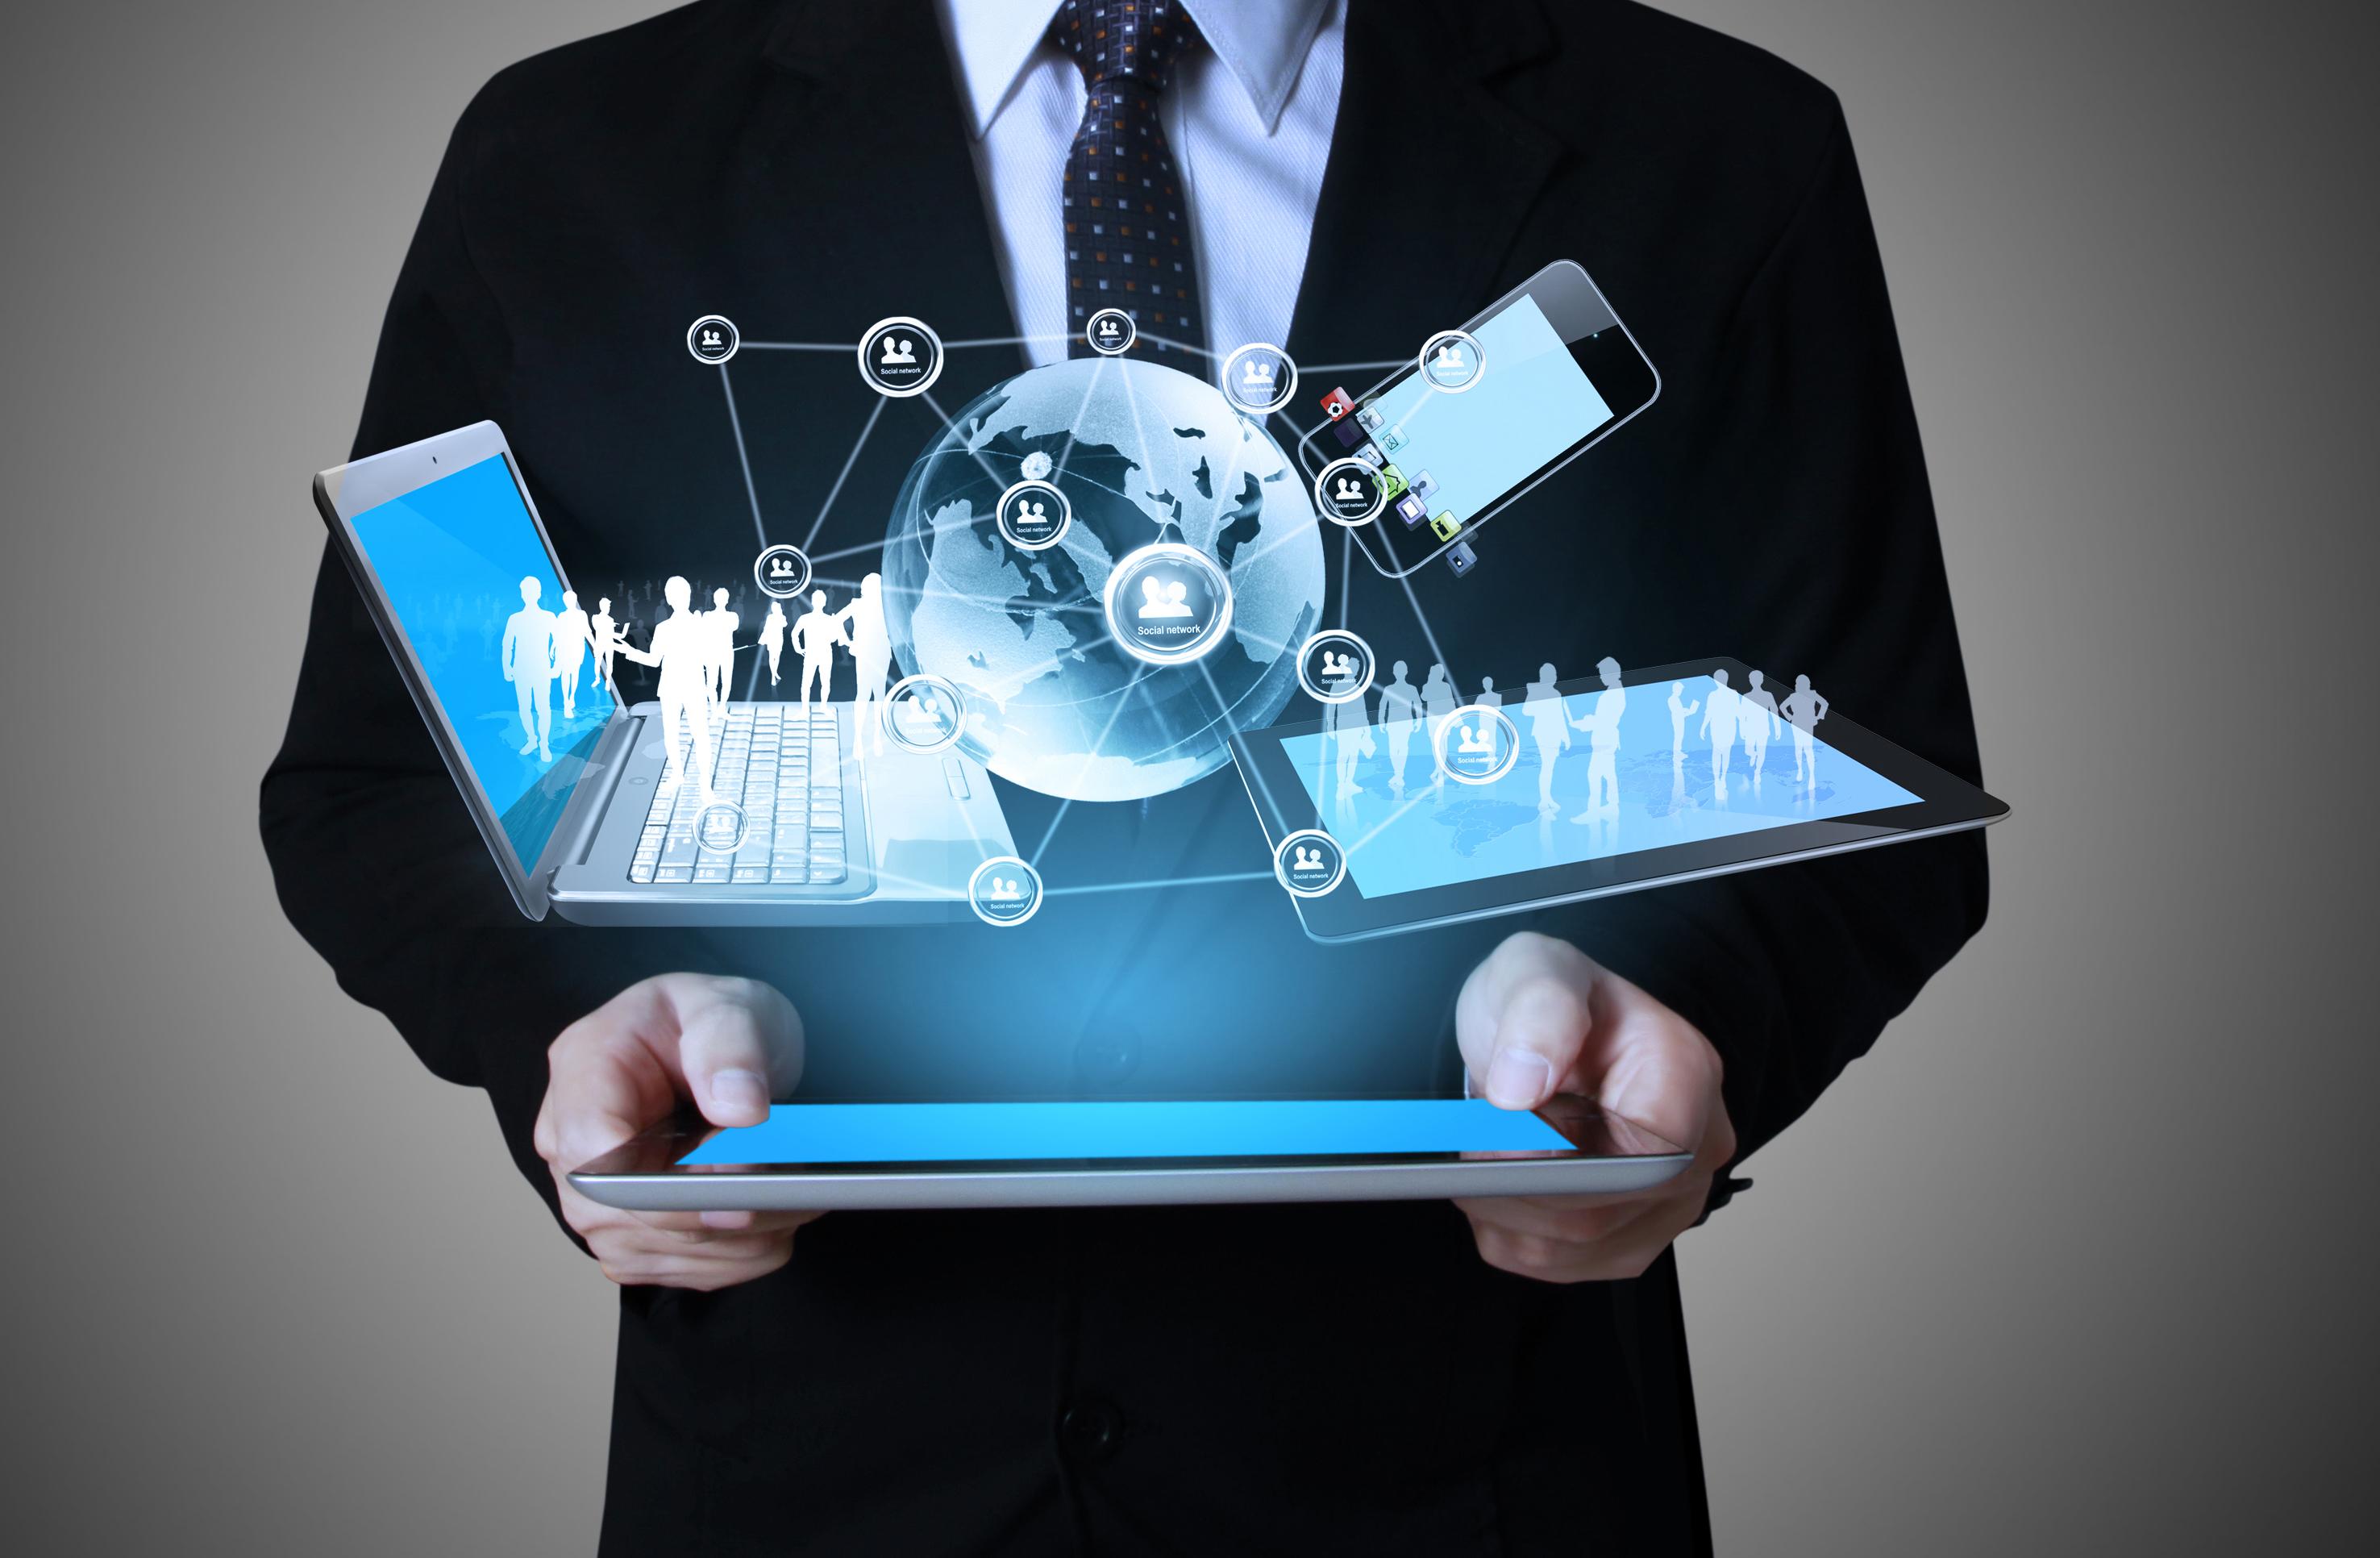 CIIO - typo or adding innovation to the CIO role?